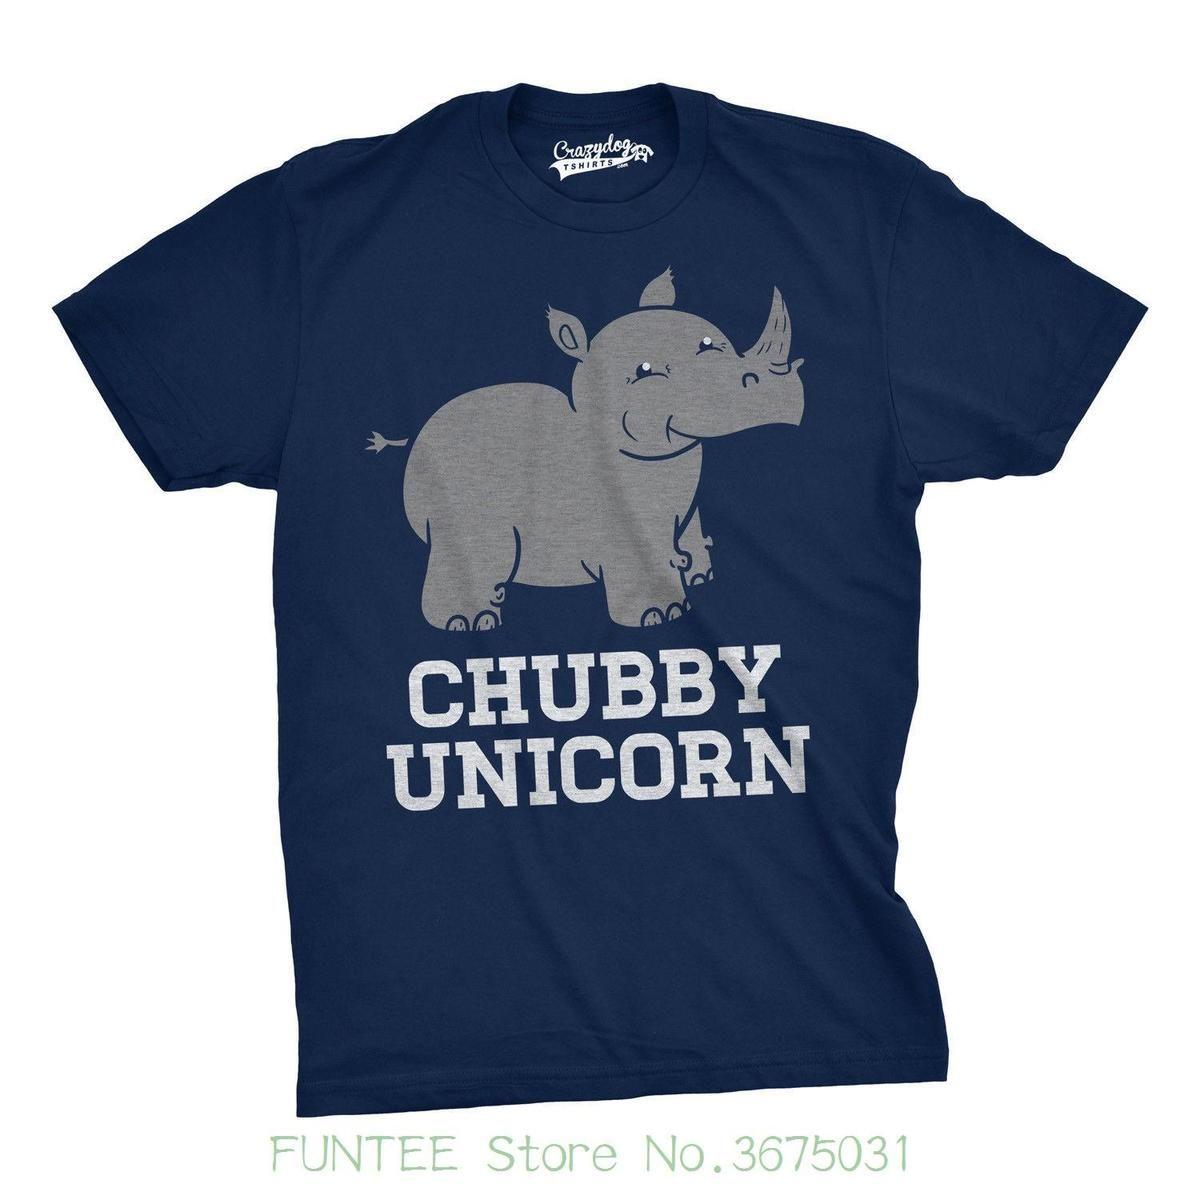 5e8e28338 Pure Cotton Round Collar Men Mens Chubby Unicorn Tshirt Funny Cute Adorable  Rhino Animal T Shirt Crazy T Shirts For Men Cheap T Shirts For Sale Online  From ...